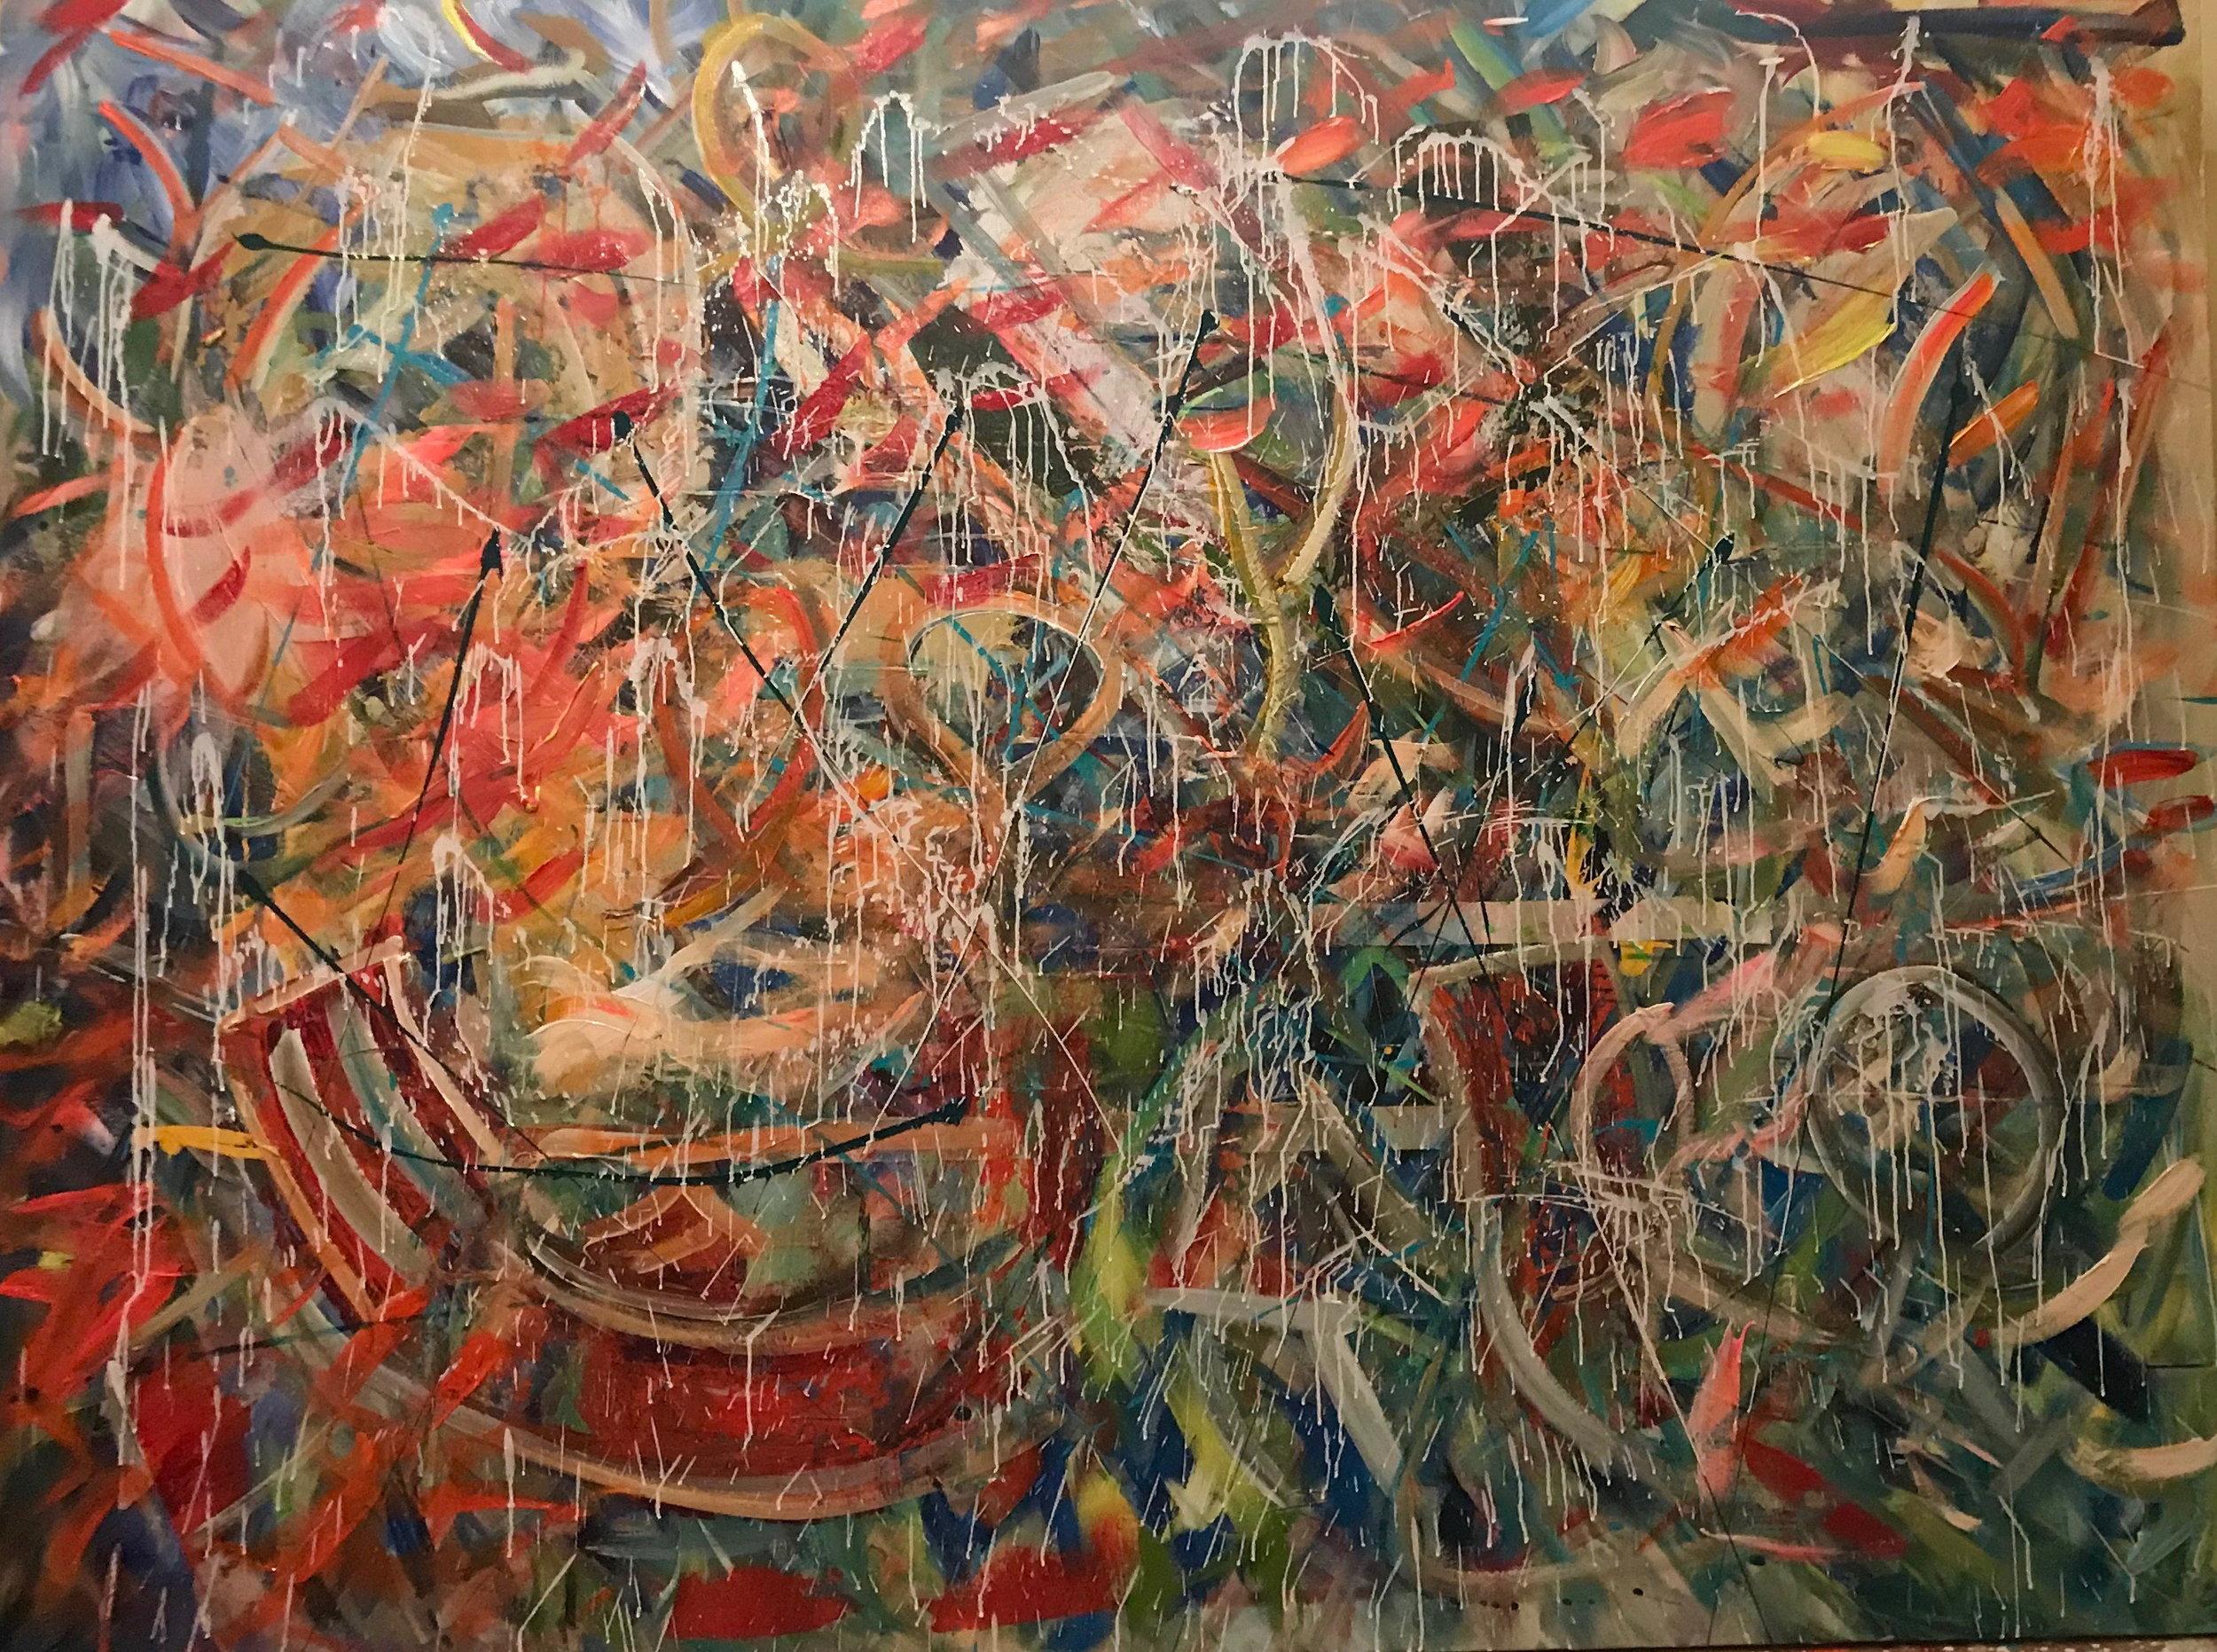 Kelly Fischer, [Transparent], 2017, 180cm x 220cm, Acrylic on Canvas.jpg